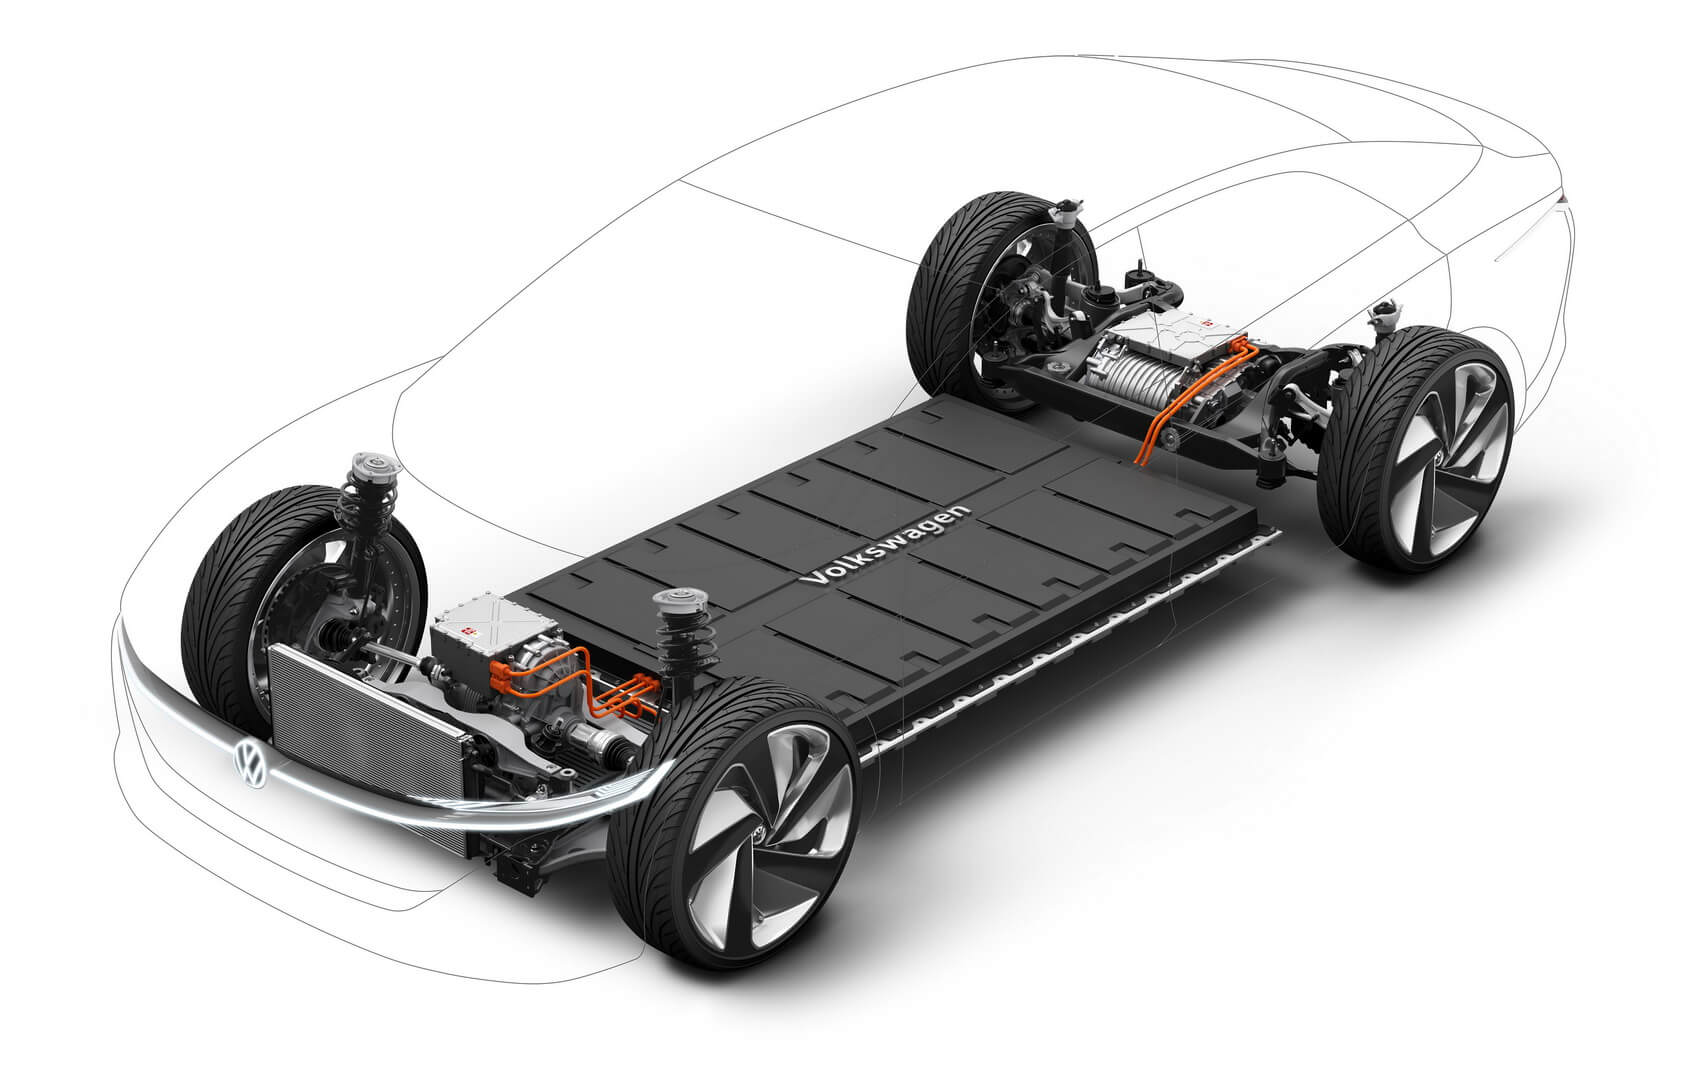 Концепткары серии «ID» от Volkswagen на базе платформы MEB